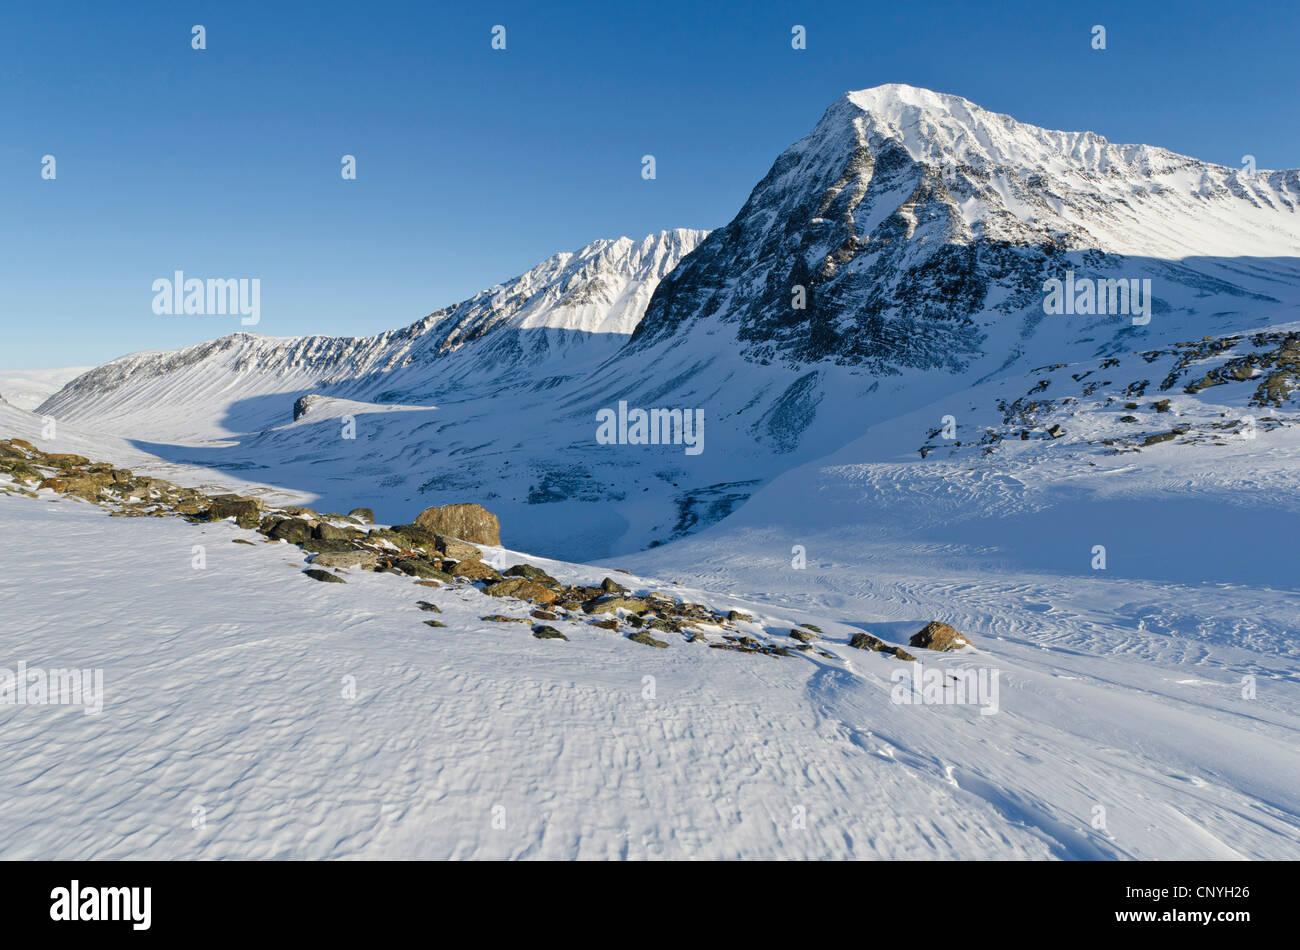 valley Unna Reaiddavaggi of Kebnekaise Fell, Sweden, Lapland, Norrbotten - Stock Image